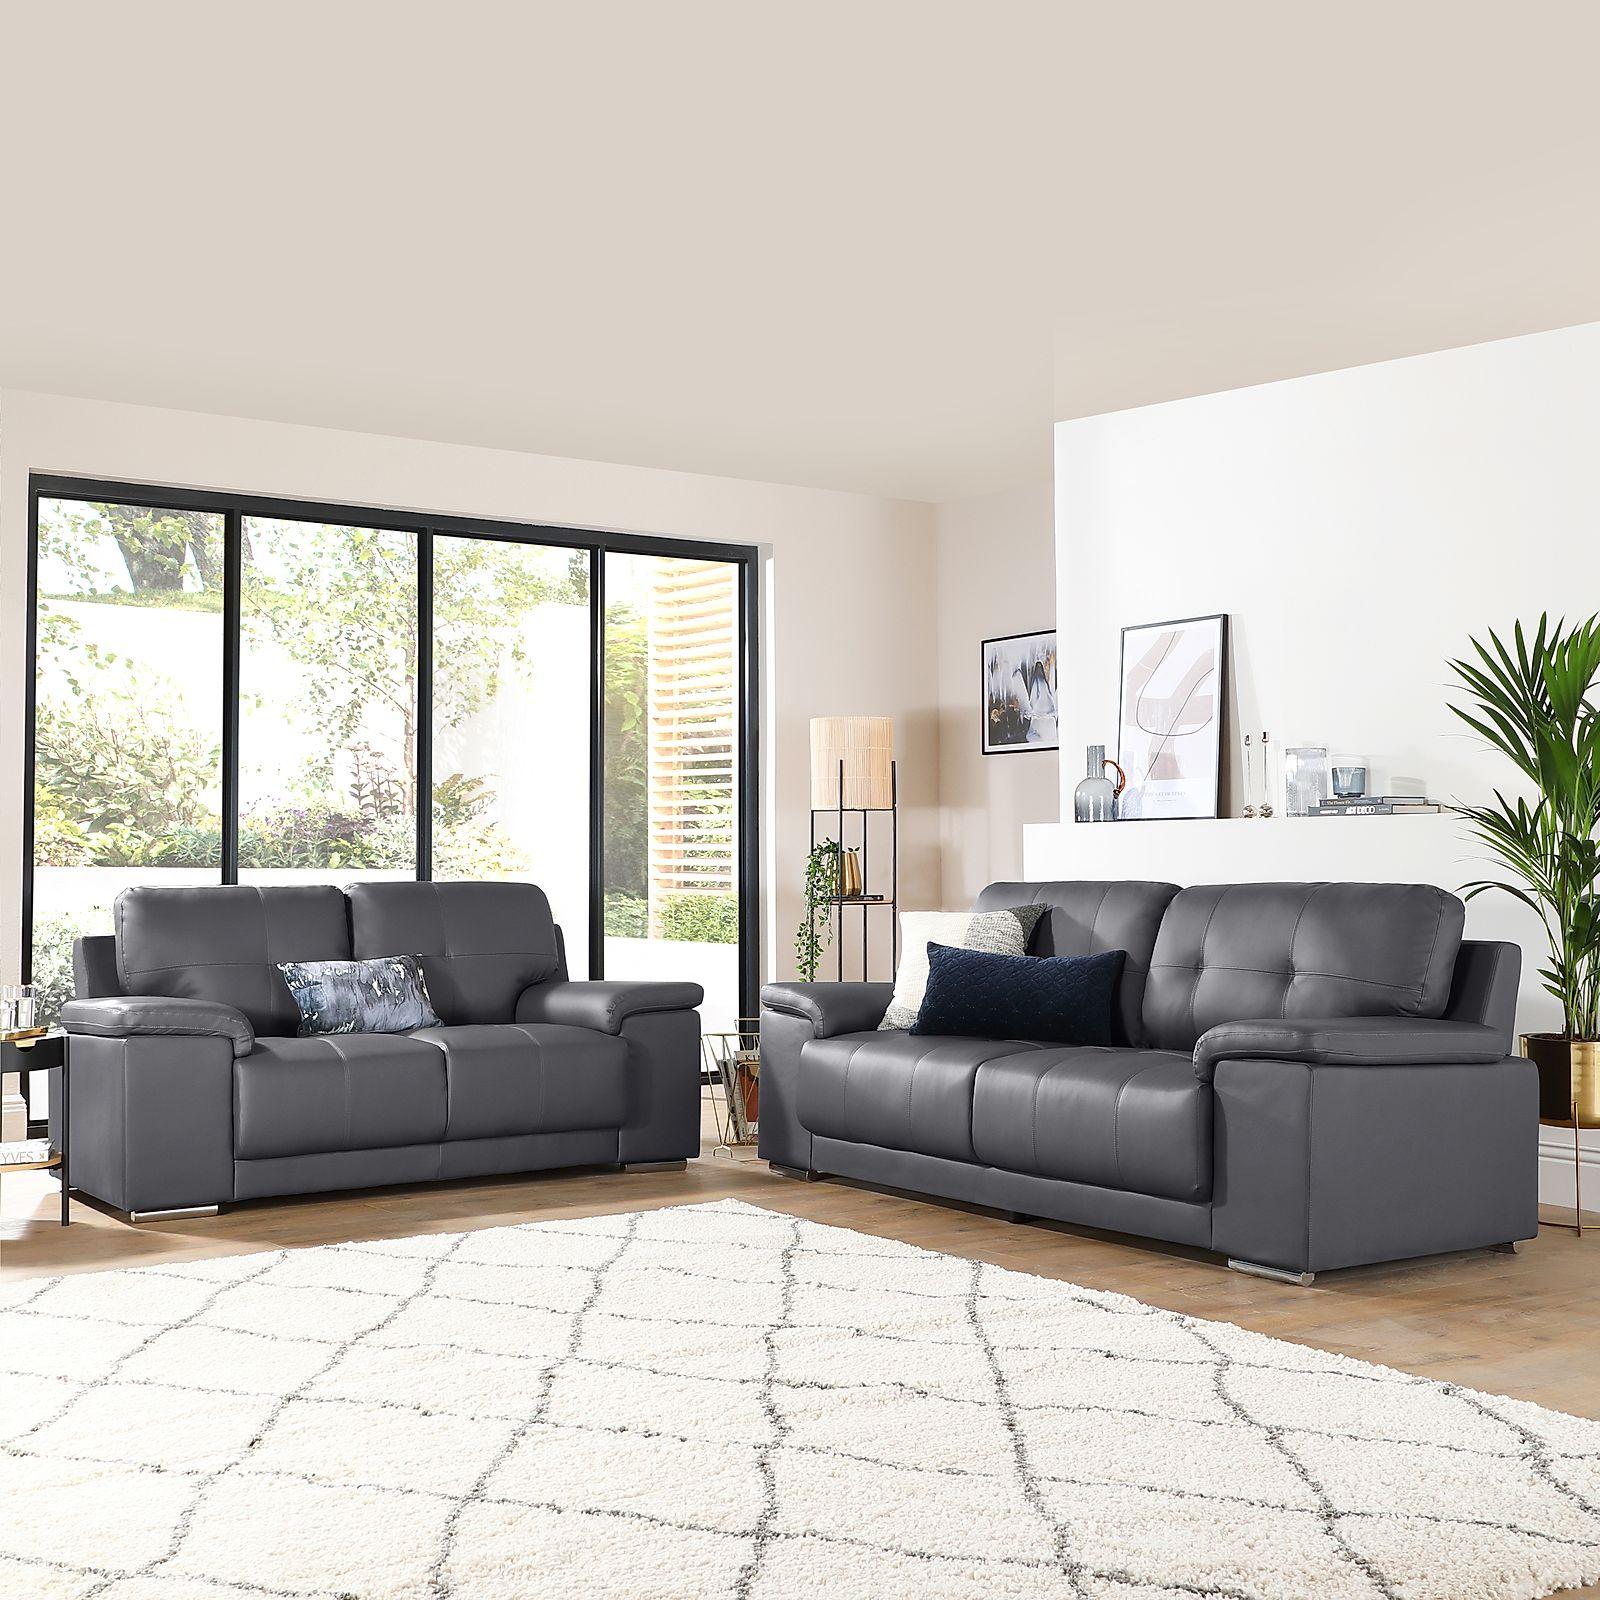 Kansas Grey Leather 3+2 Seater Sofa Set | Furniture Choice Pertaining To Grey Sofa Chairs (View 6 of 15)